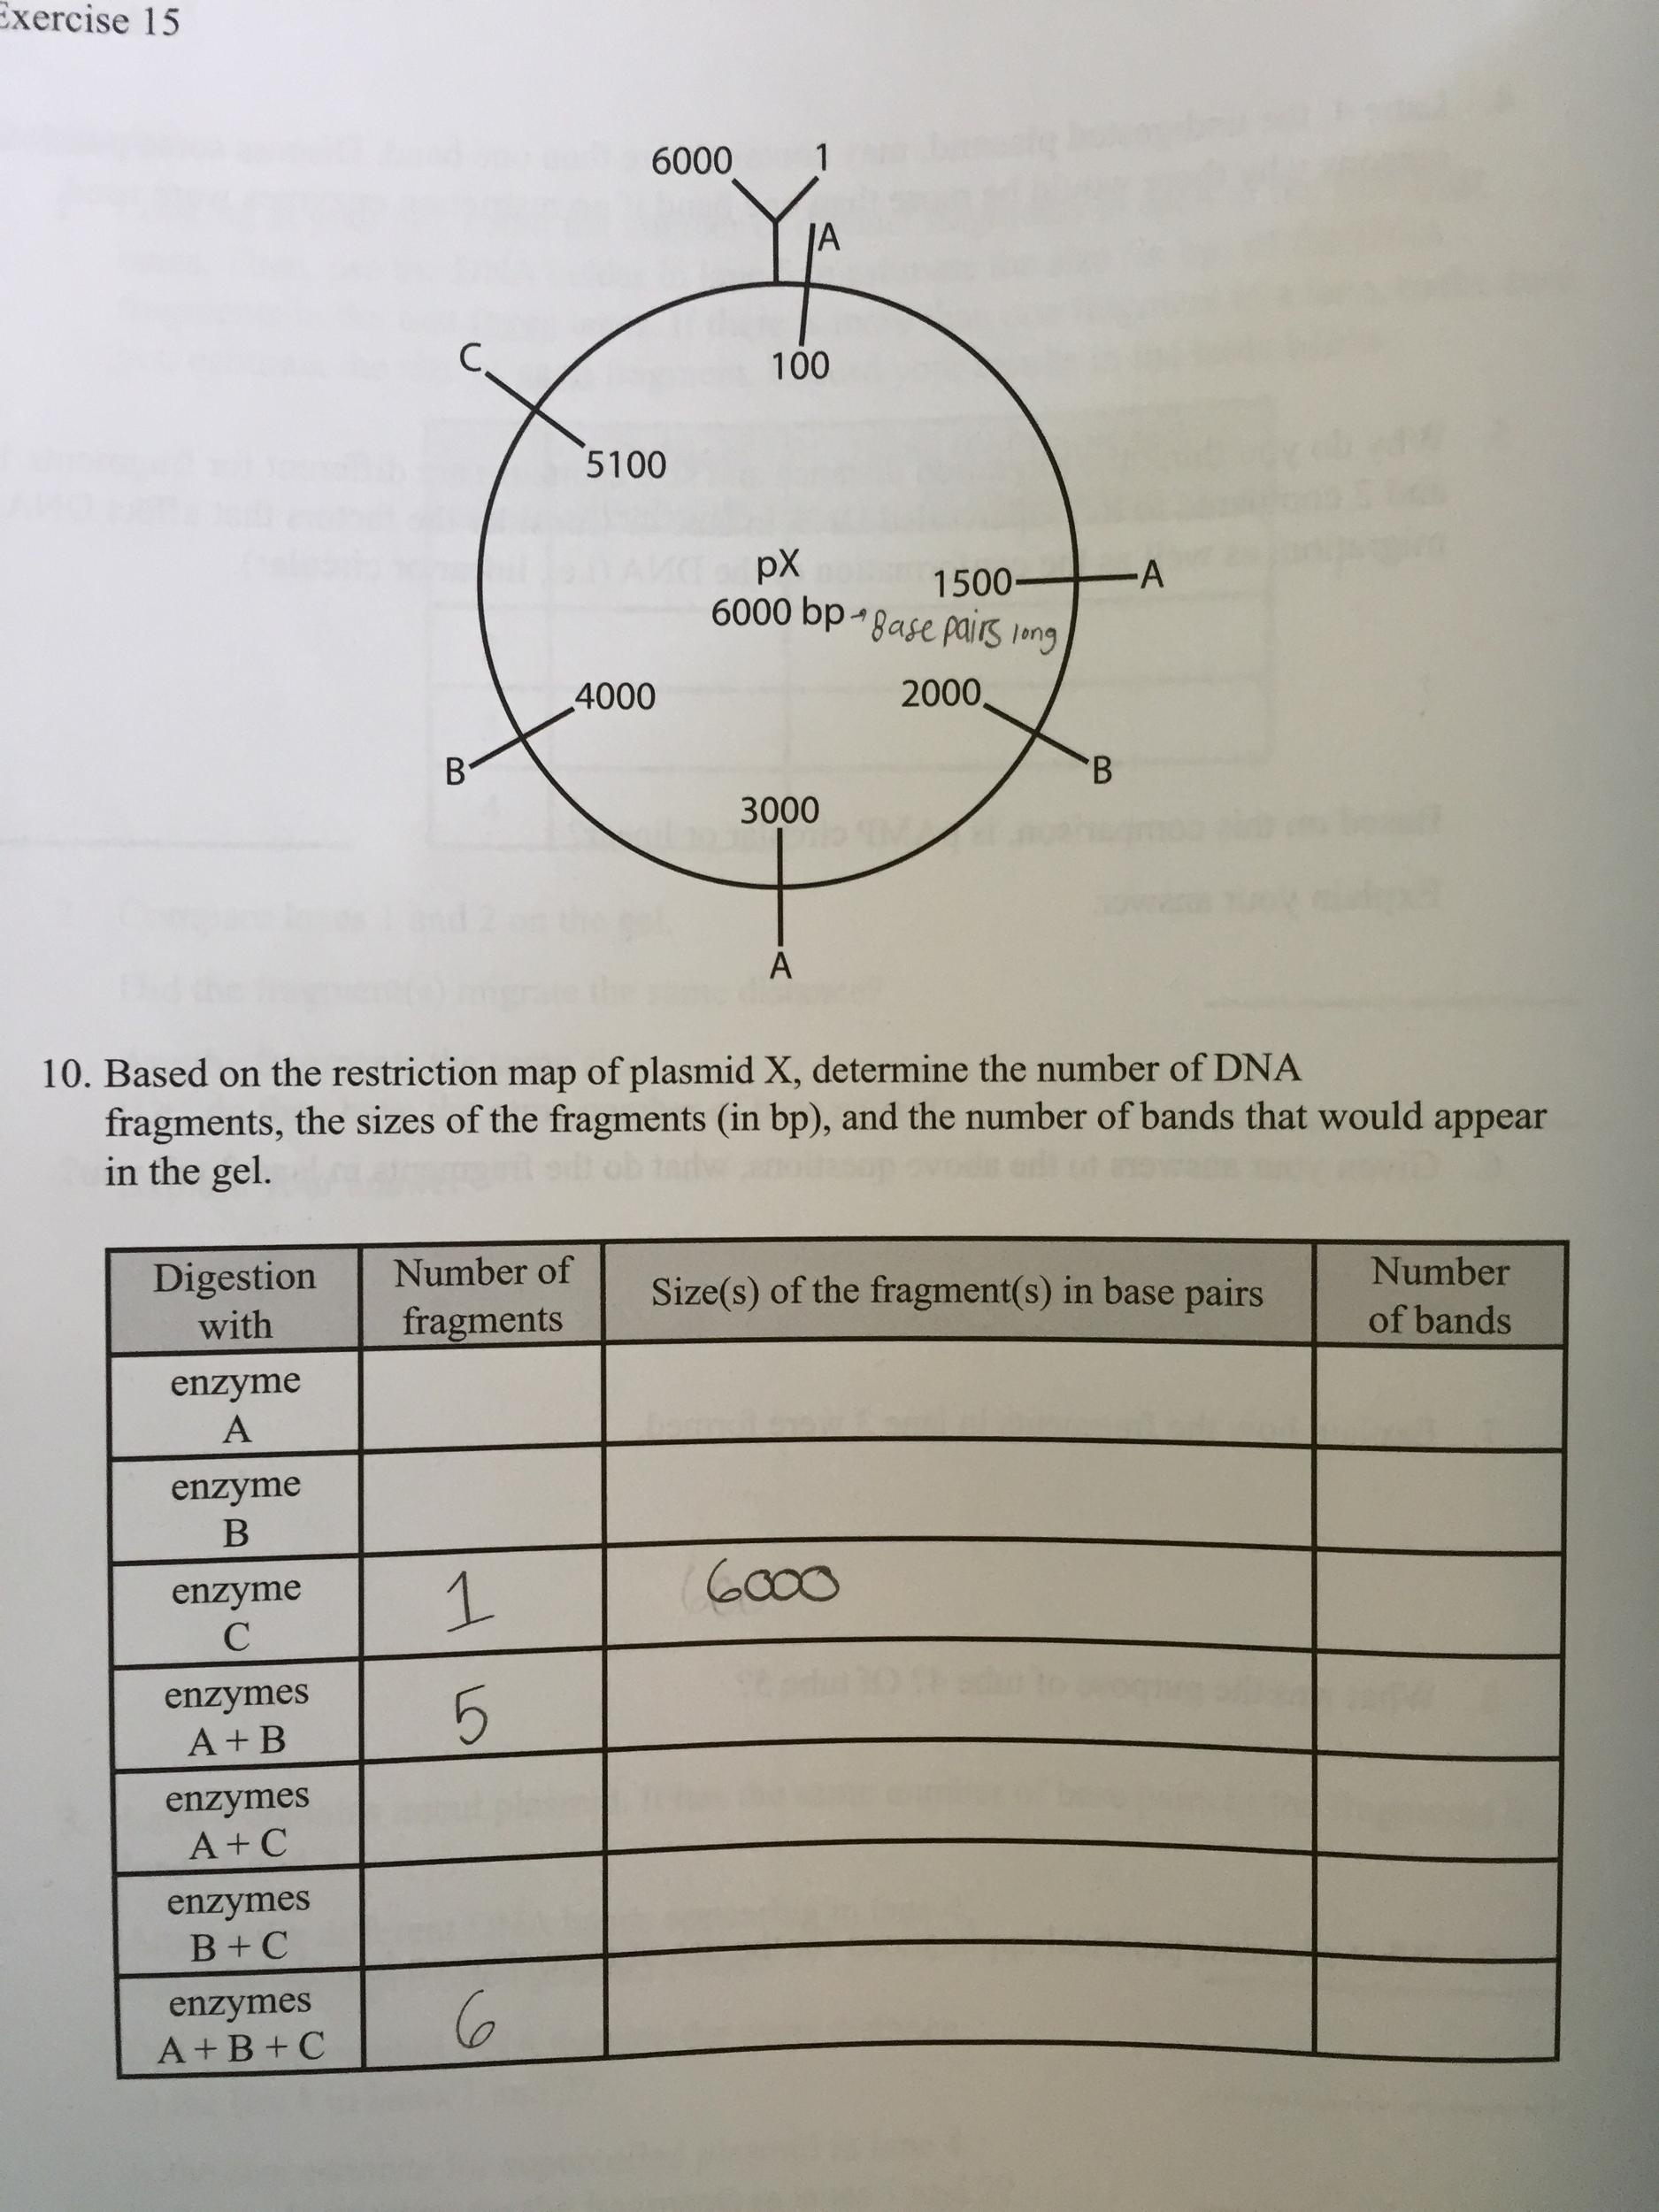 kinetics lab essay View essay - kinetics essay from chem c 126 at indiana university, bloomington westfall1 nathan westfall c126 kinetics lab summary 10/5/14 kinetics.